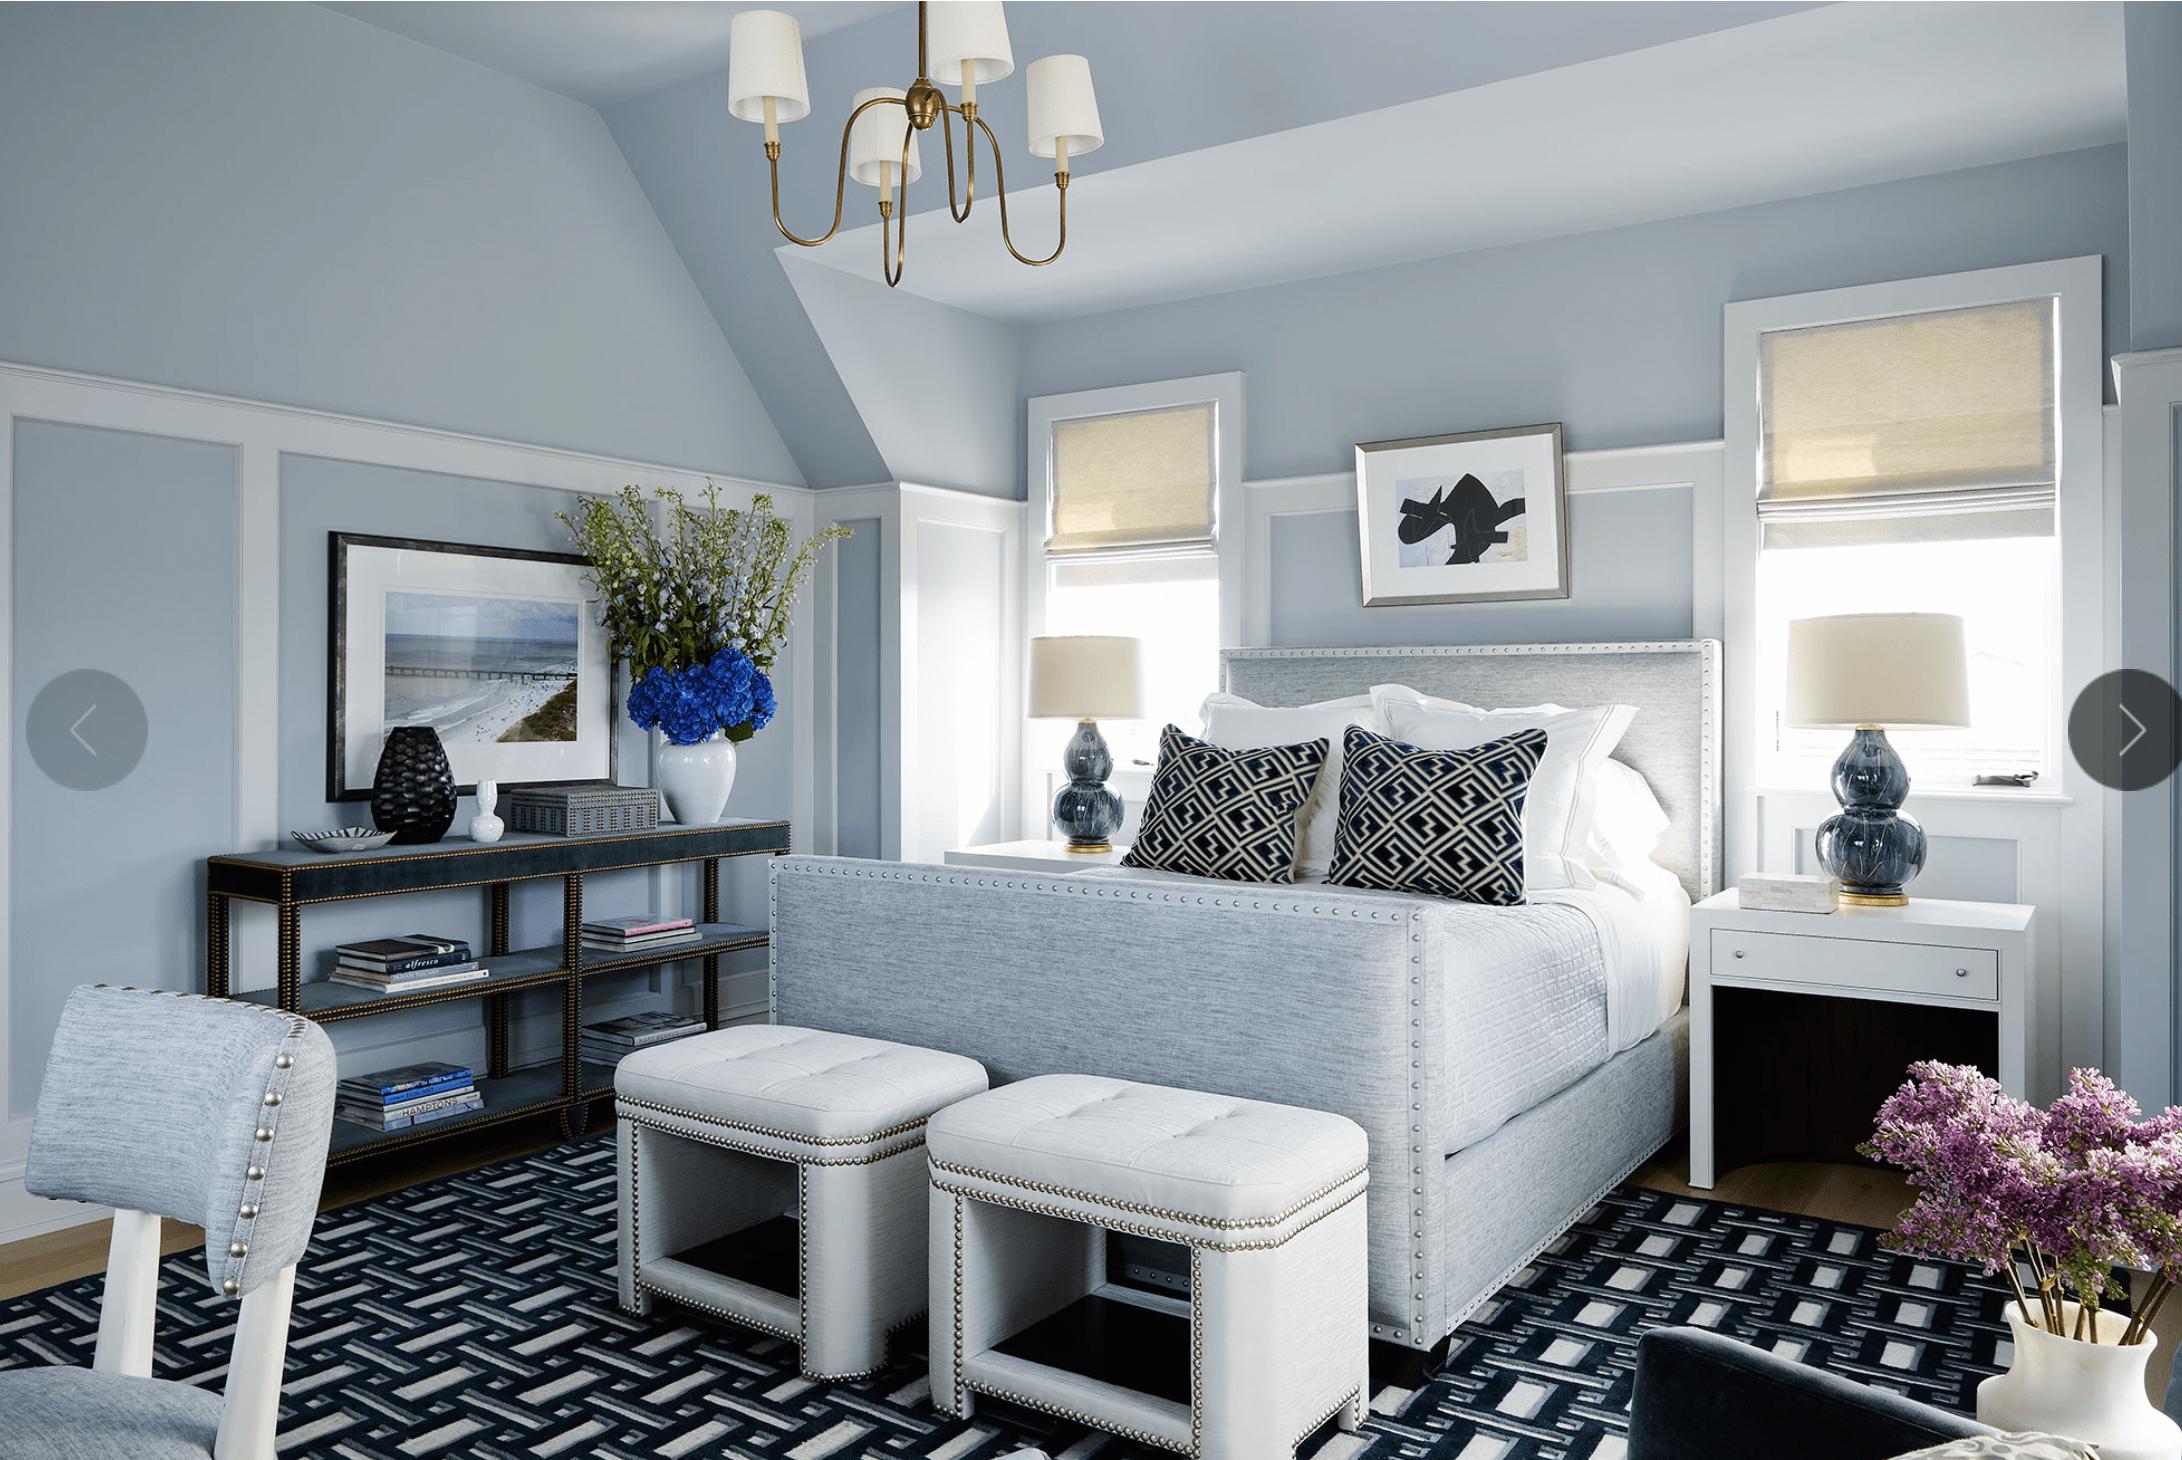 james michael howard designed bedroom